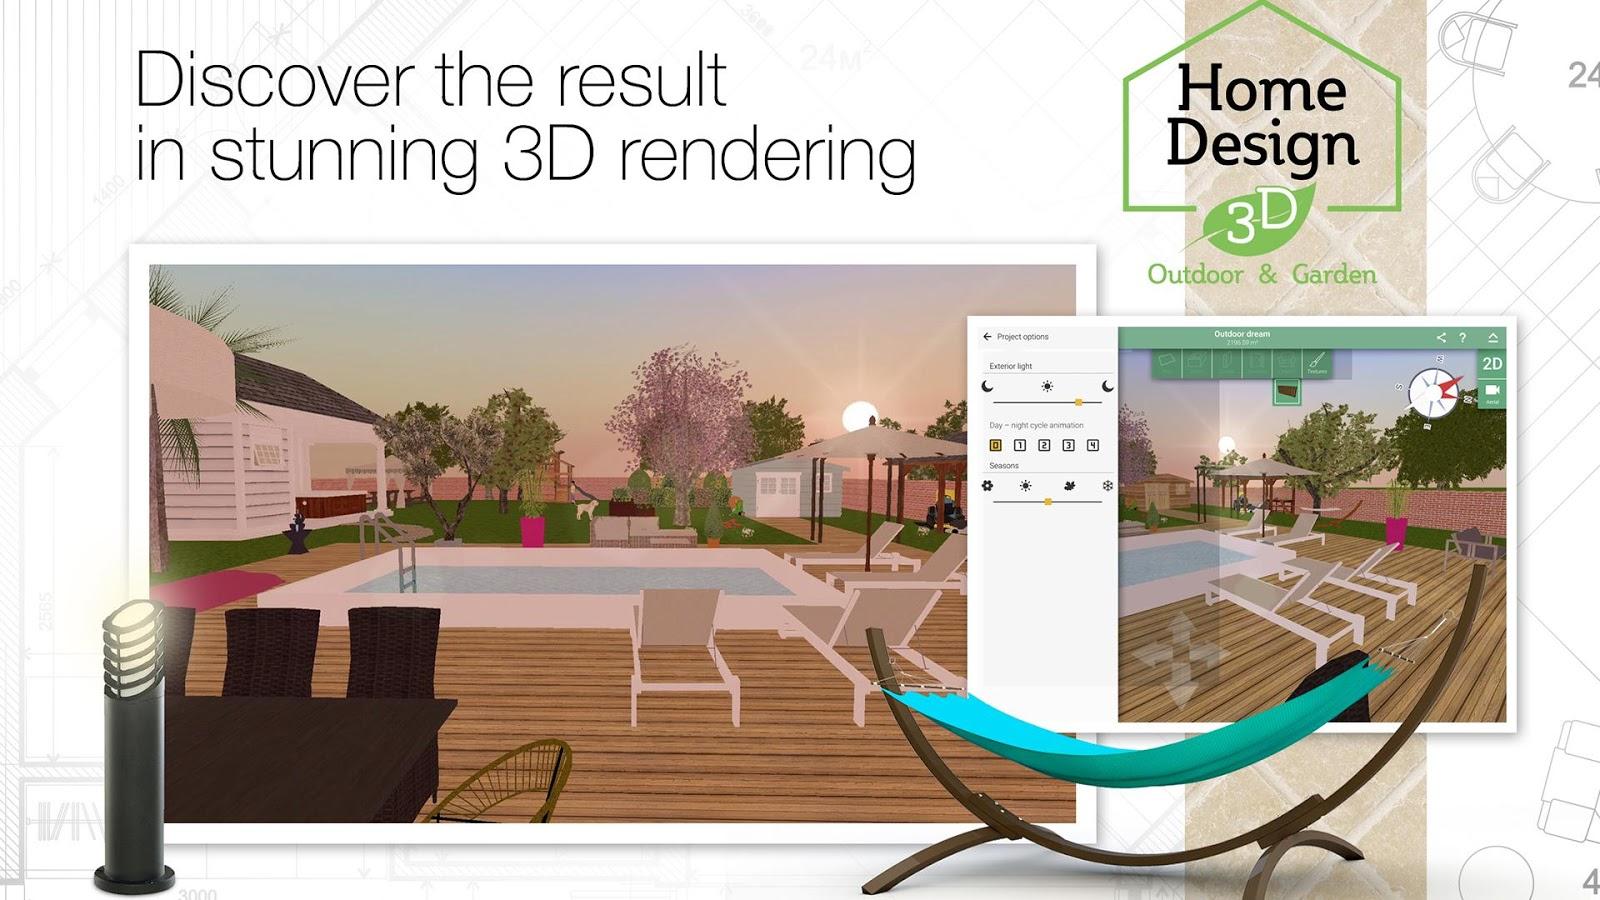 Home Design 3D Outdoor/Garden 4.0.8 APK + OBB (Data File) Download ...